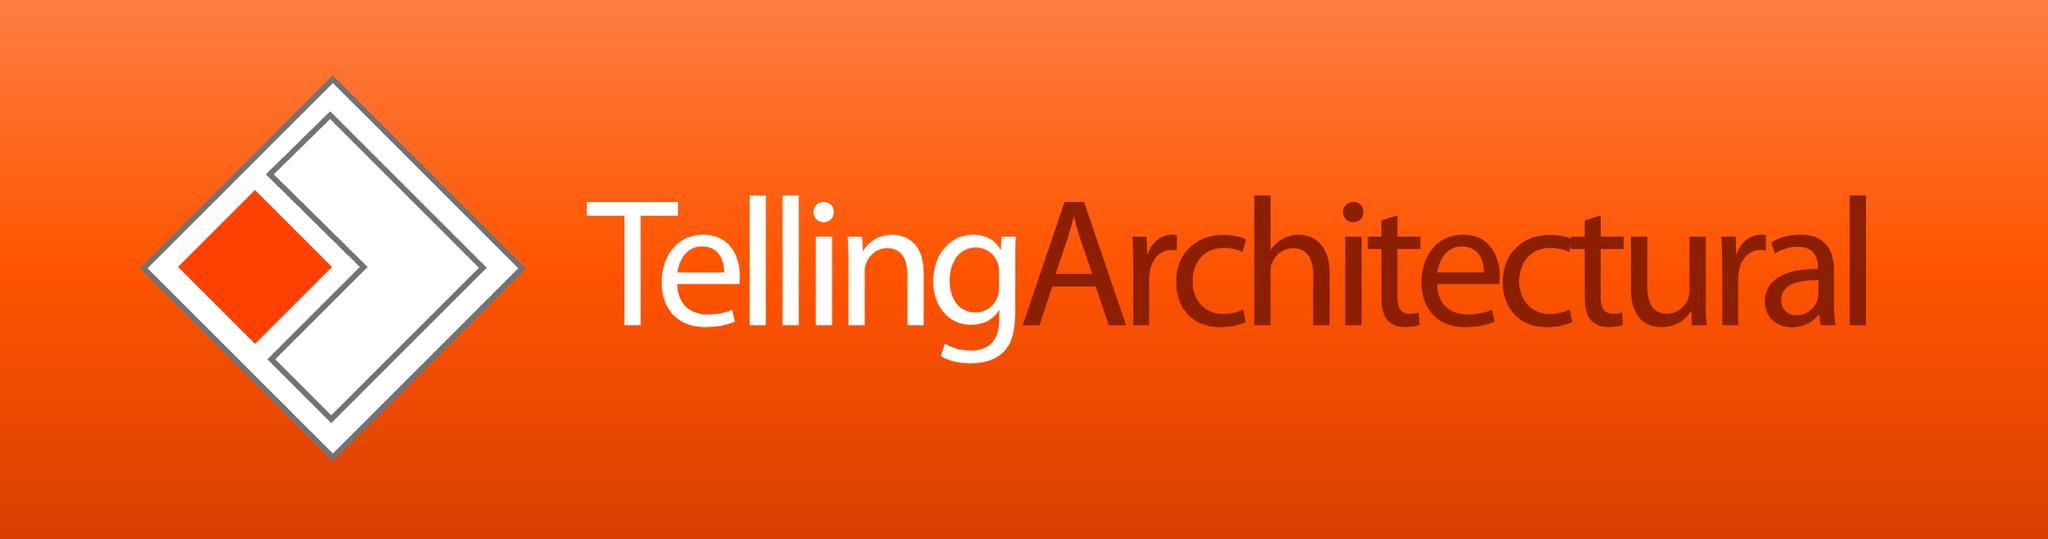 Telling Architectural Ltd